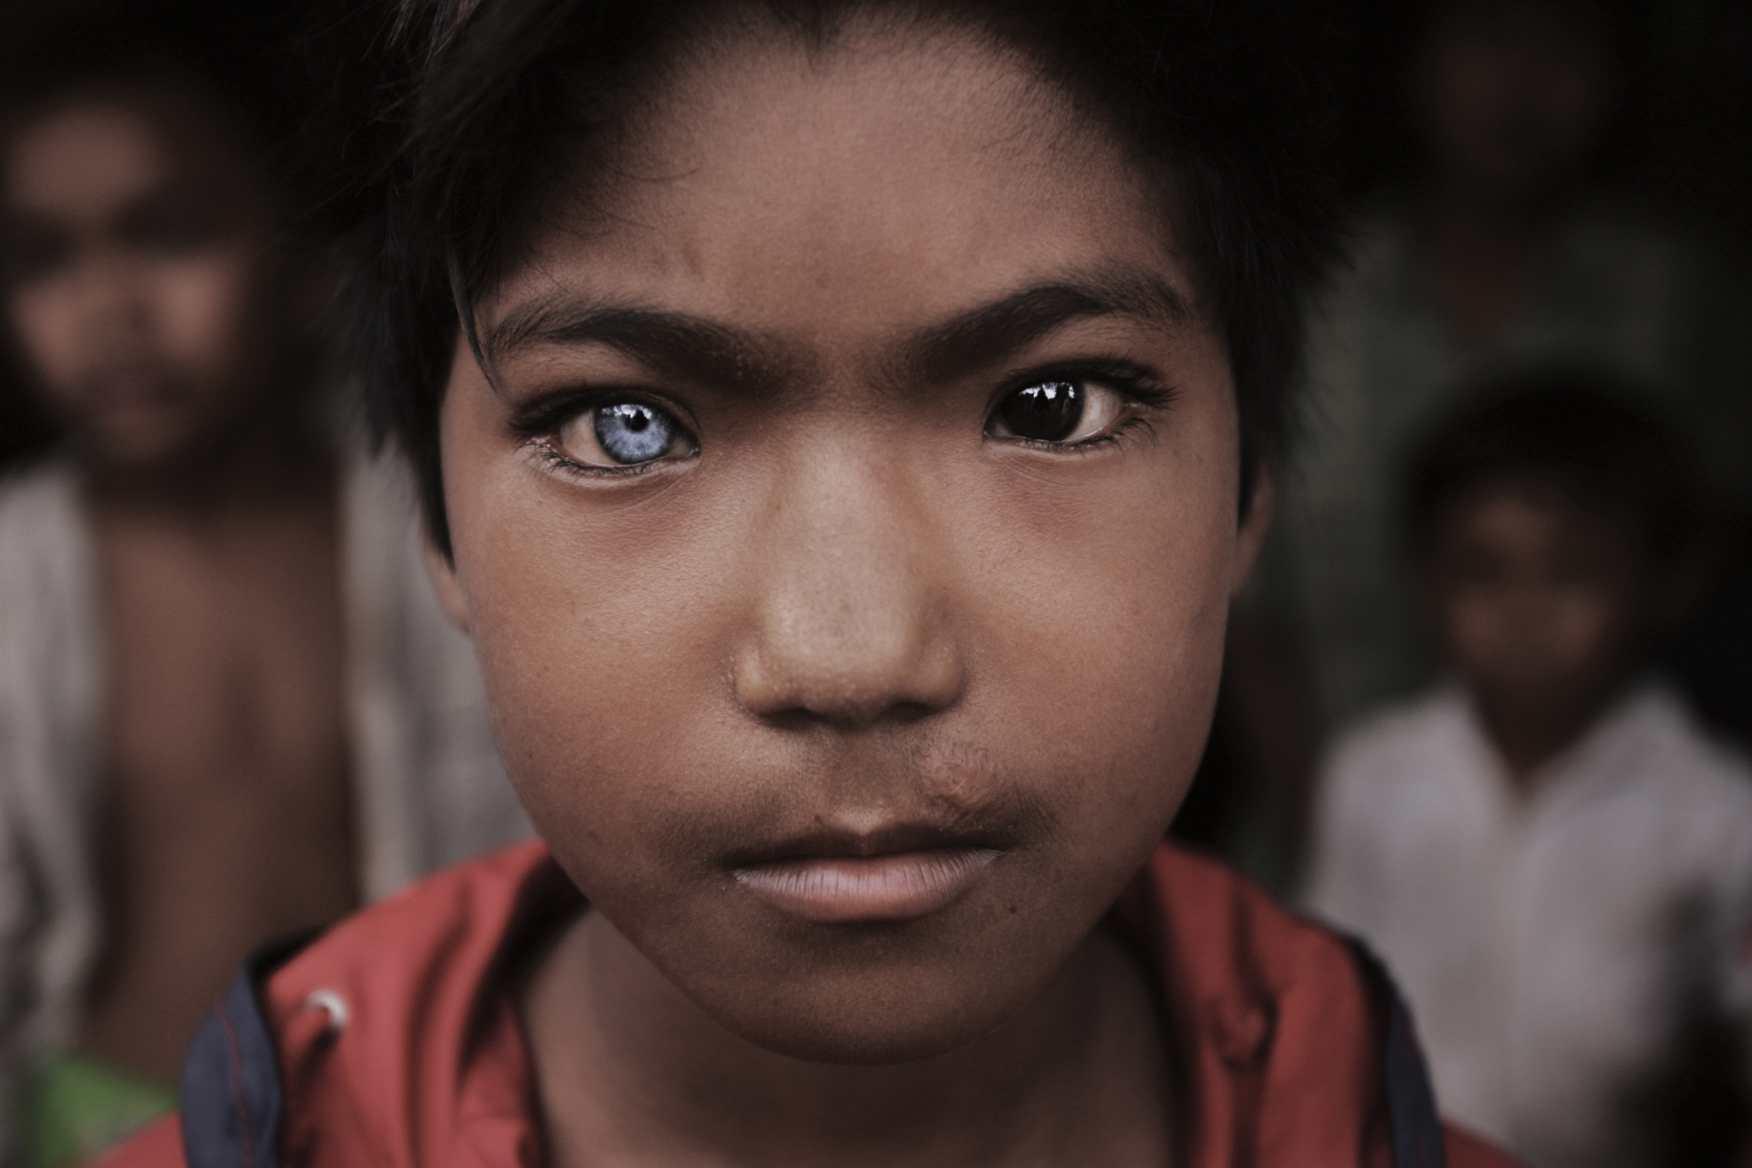 Blue Eyed, Brown Eyed Boy. Cambodia-Thai border. 2008